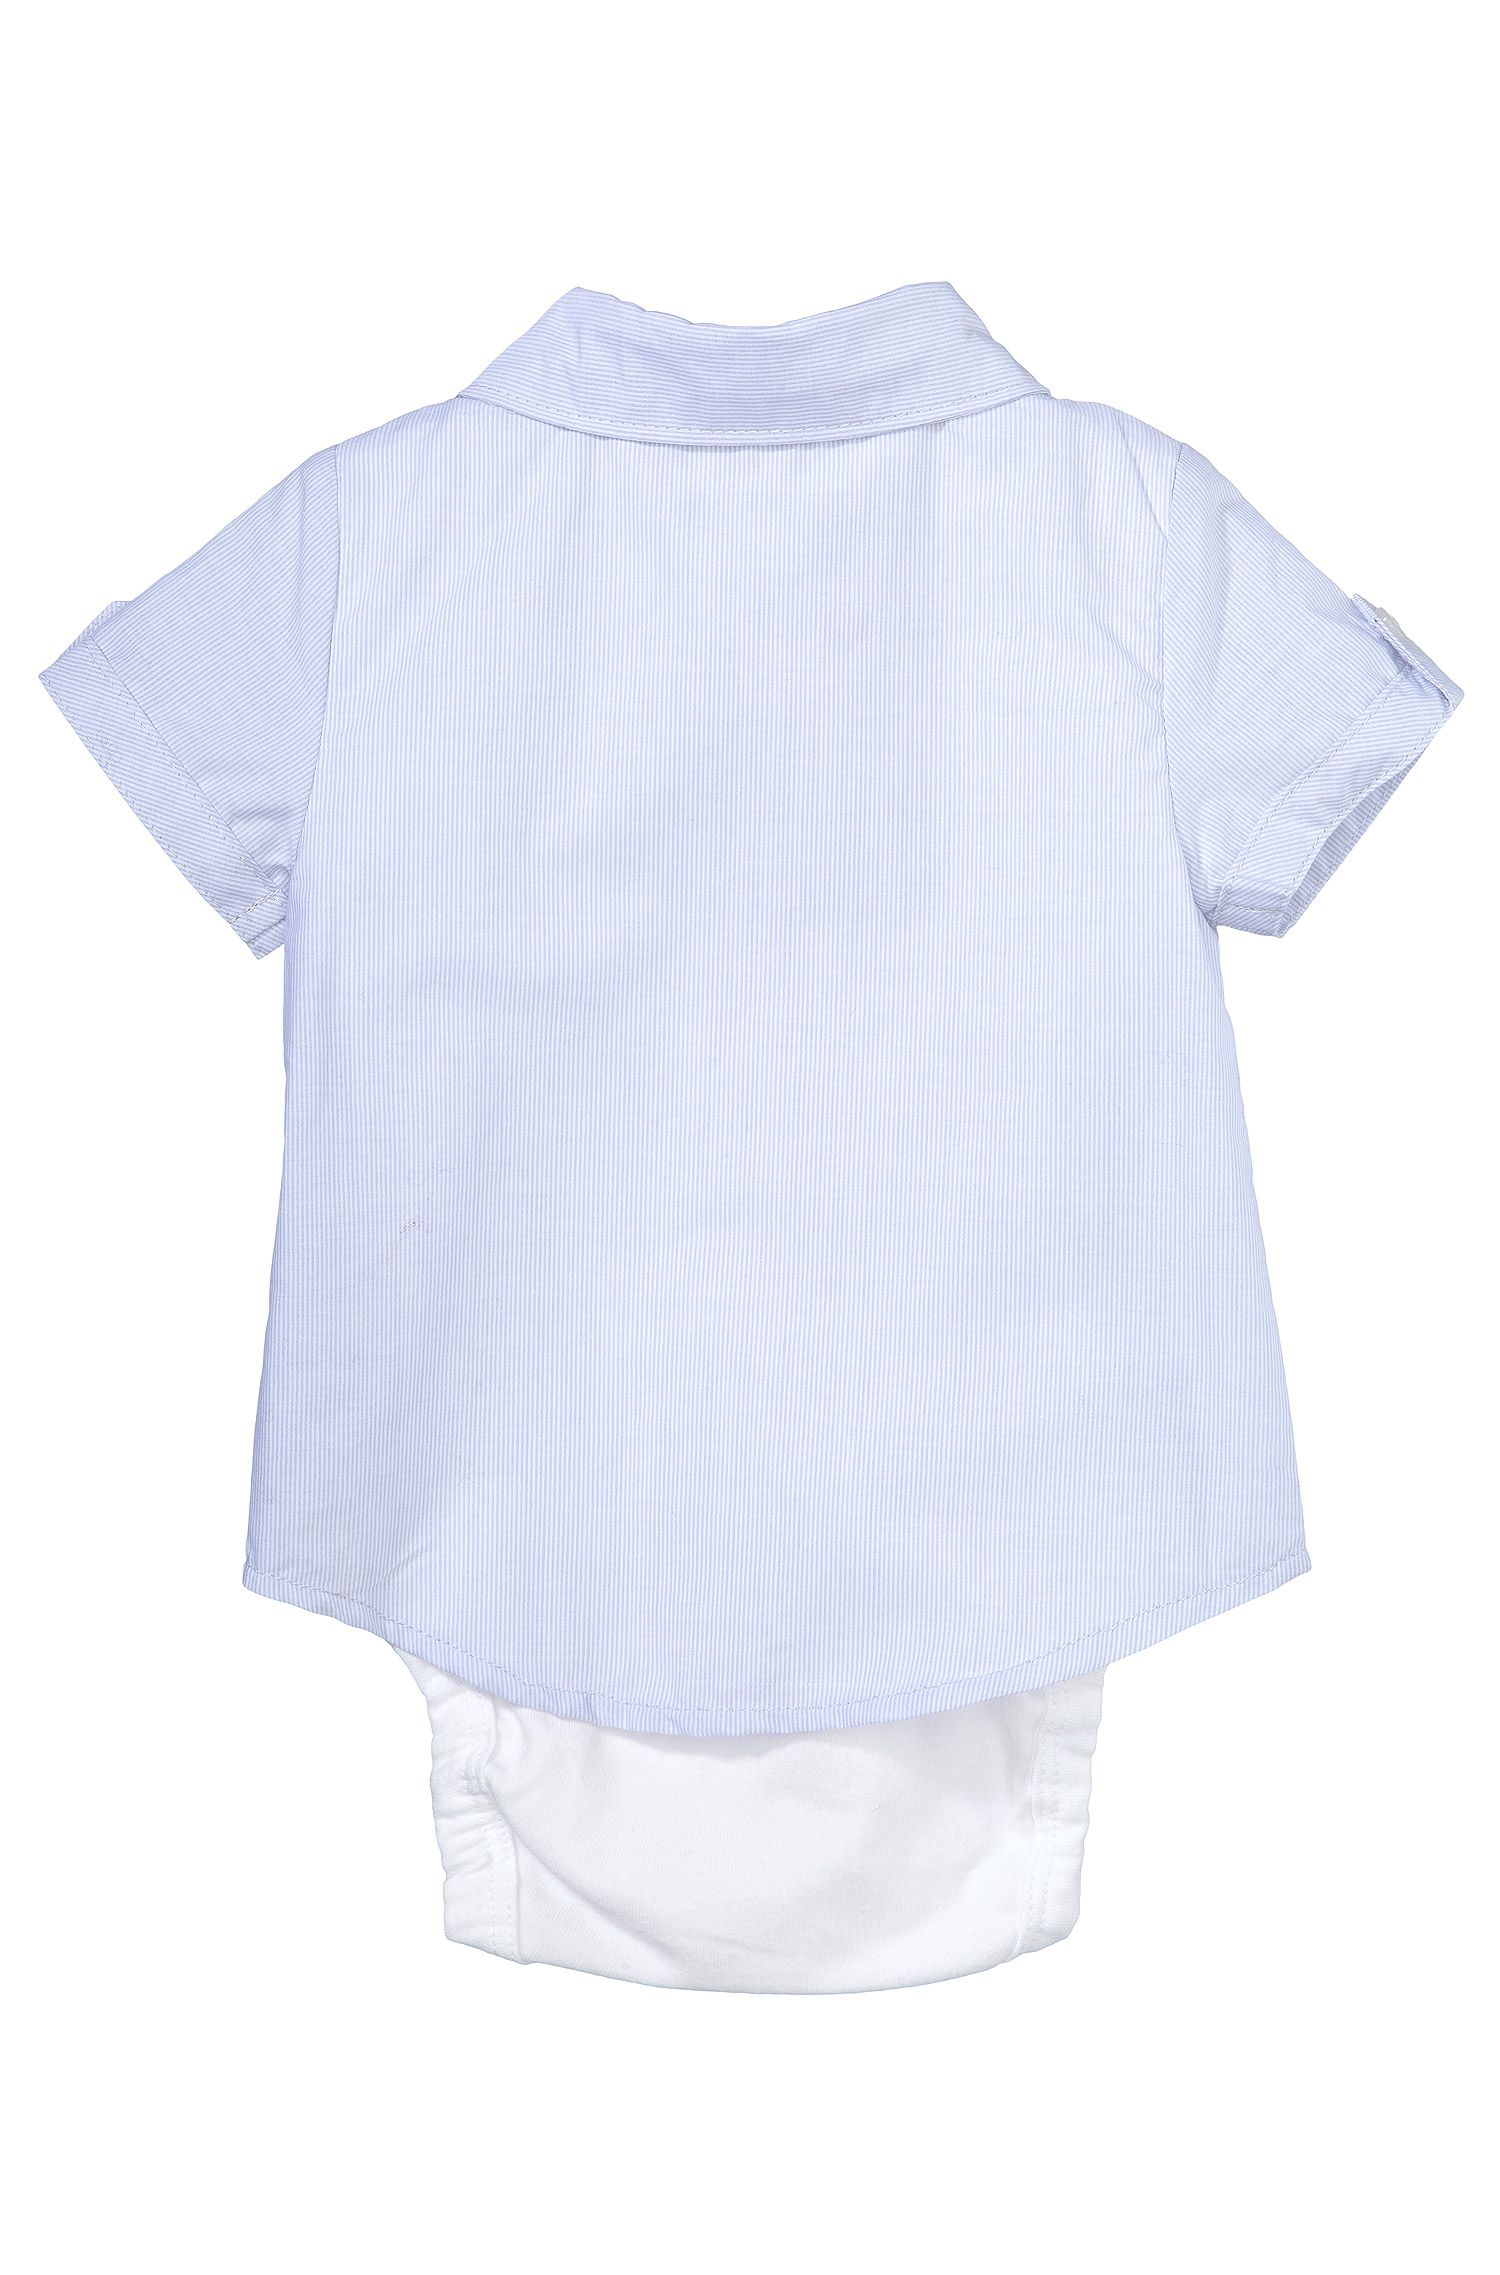 Kids-Hemd-Body ´J97080` aus Baumwolle